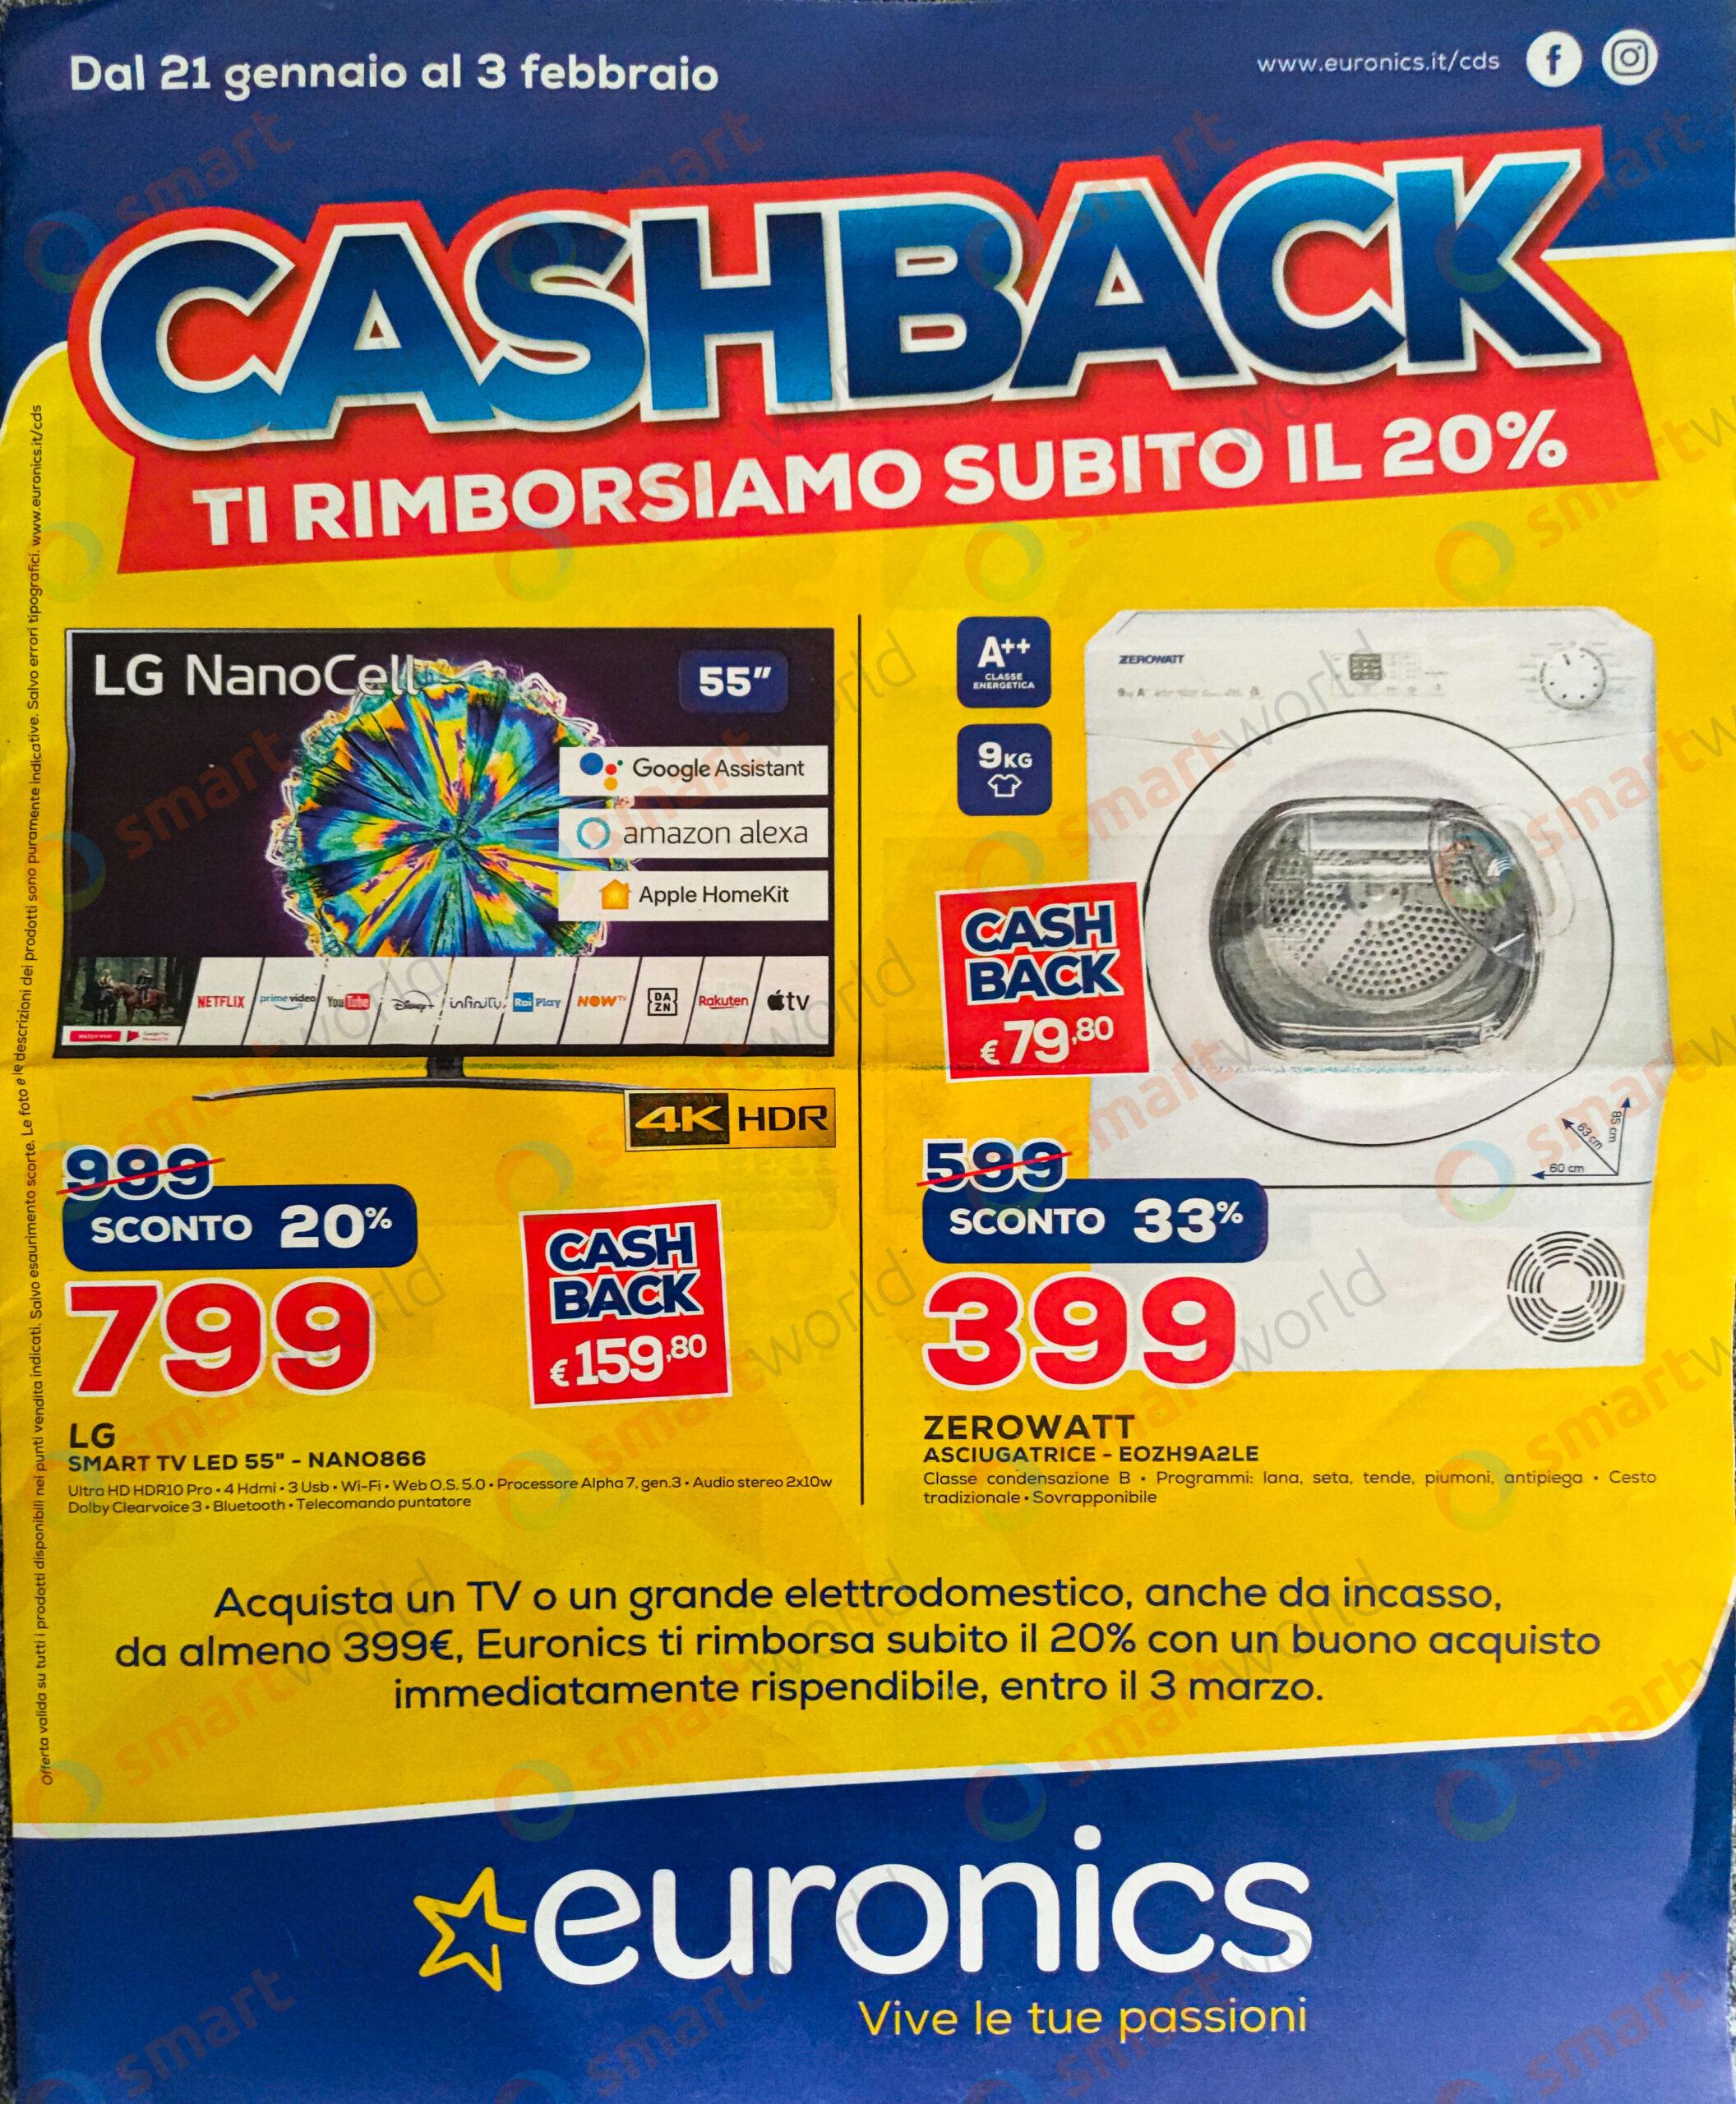 offerte euronics cashback